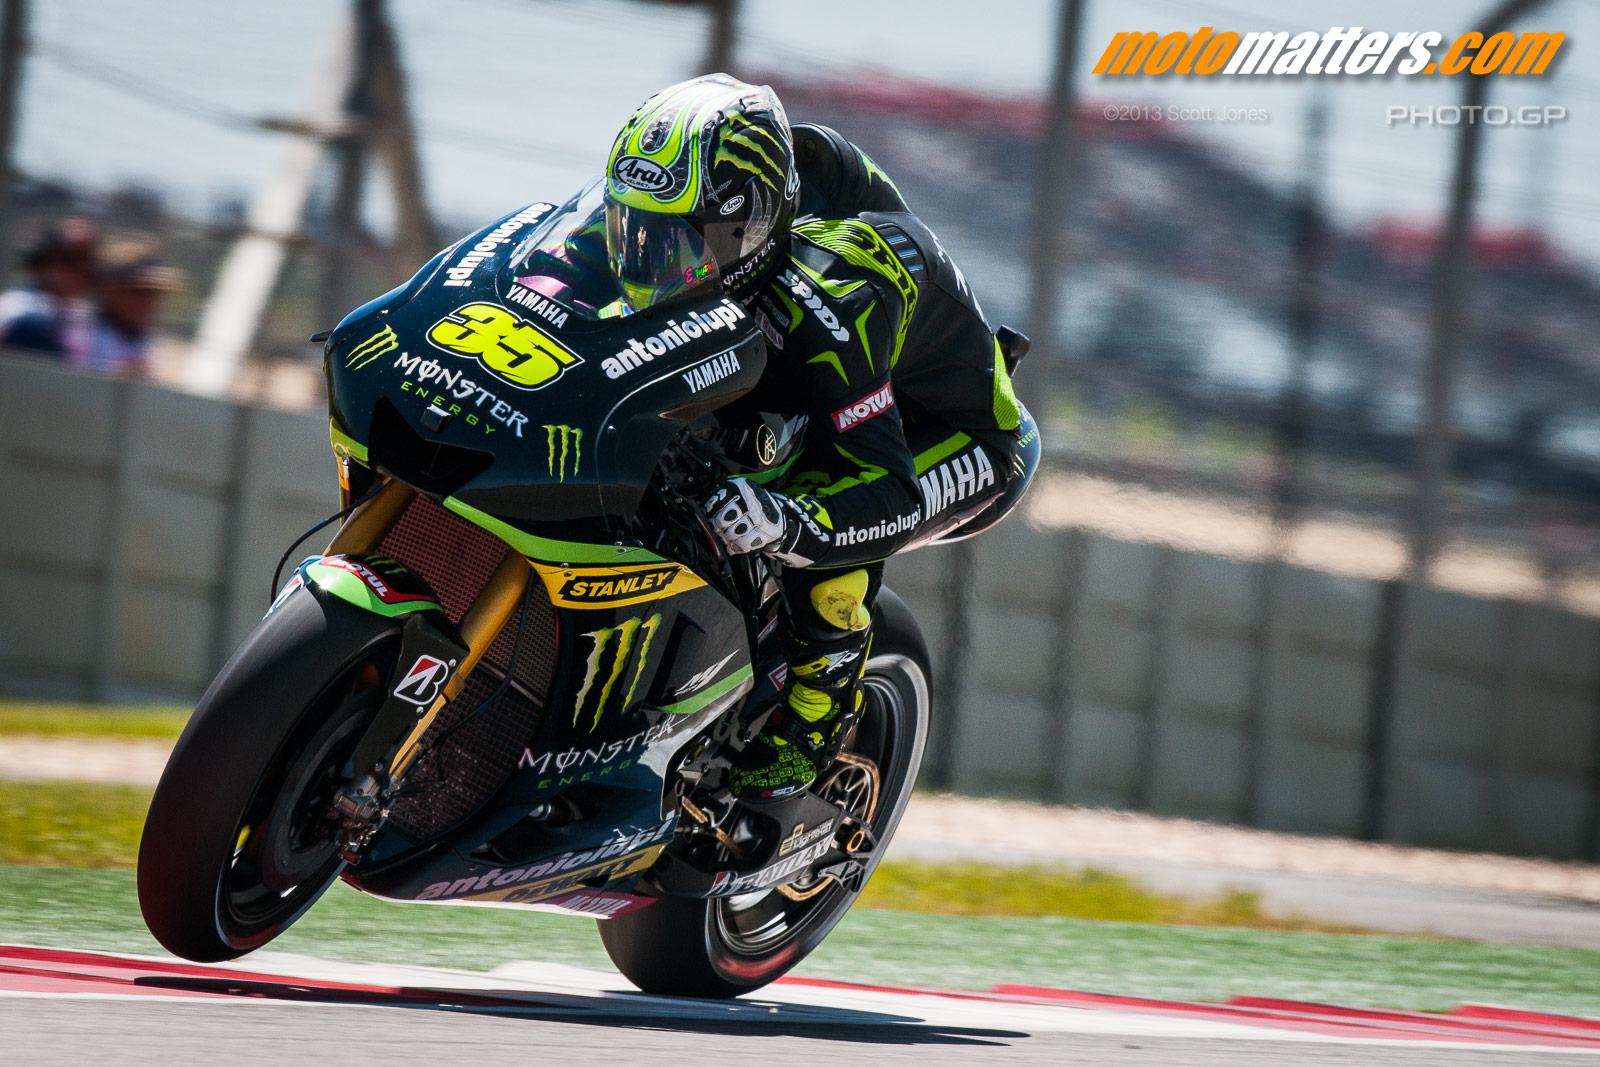 [GP] Austin 2013-MotoGP-01-CotA-Friday-0878-O